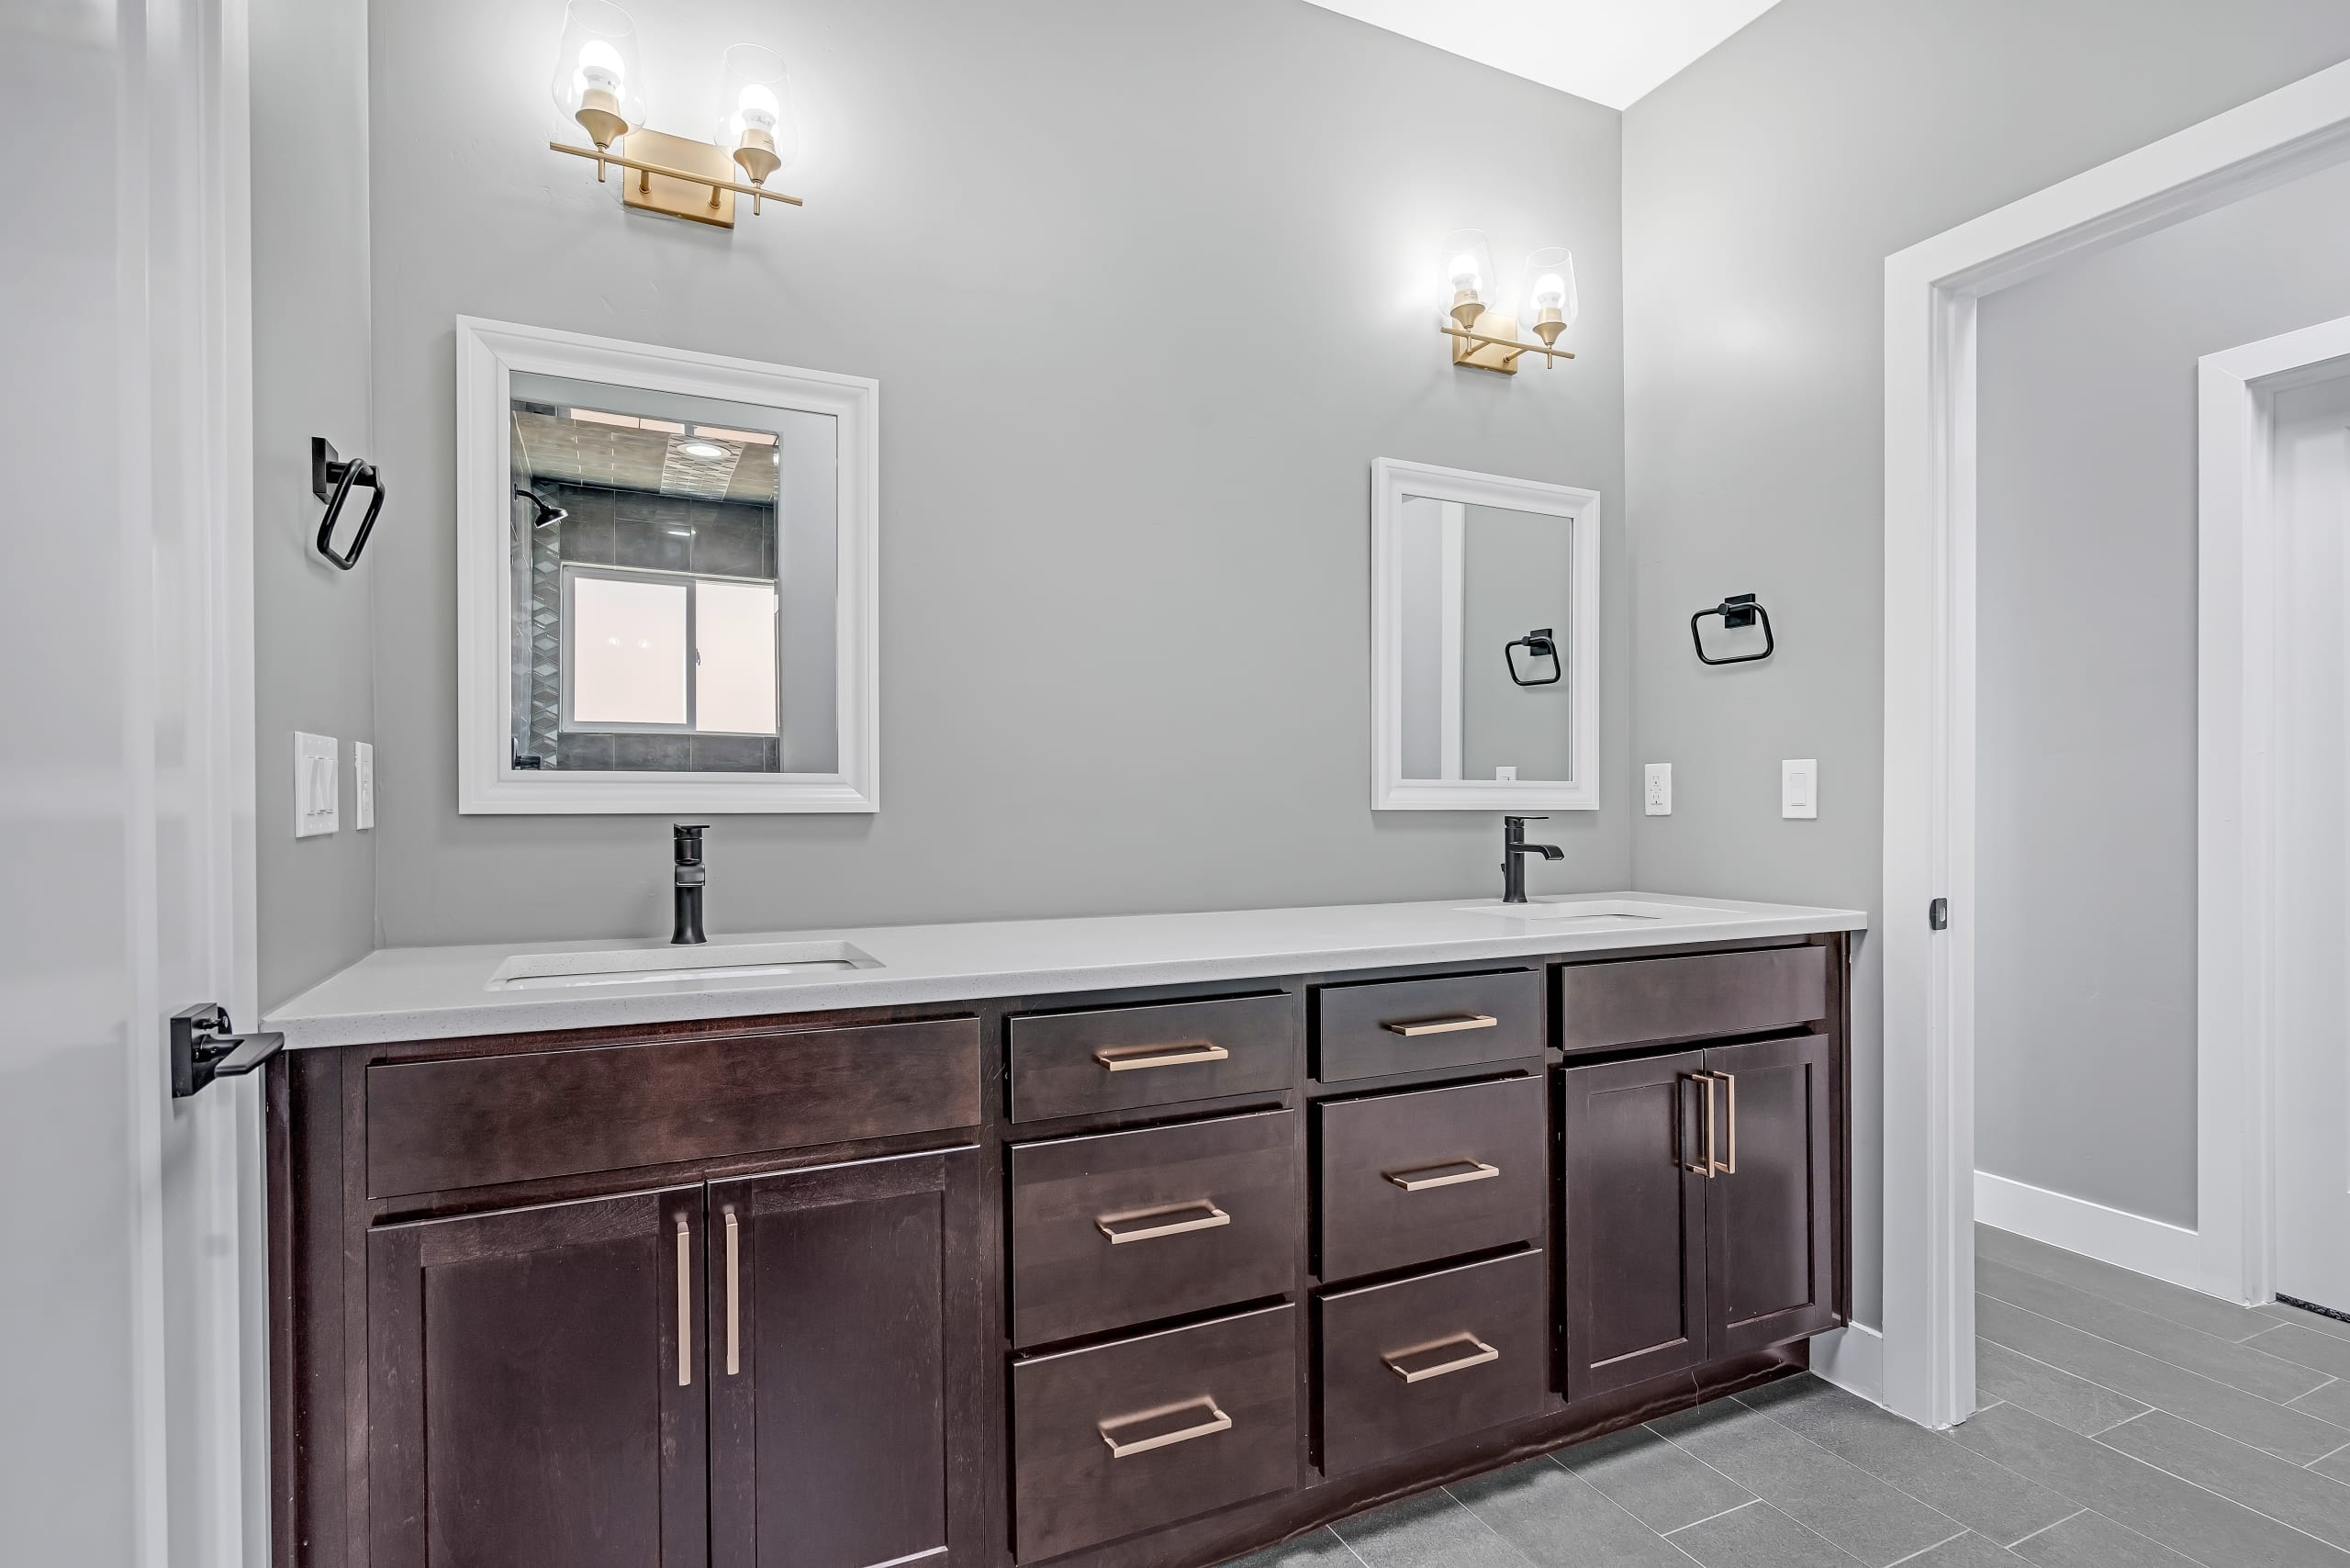 Bathroom - Dual Sinks